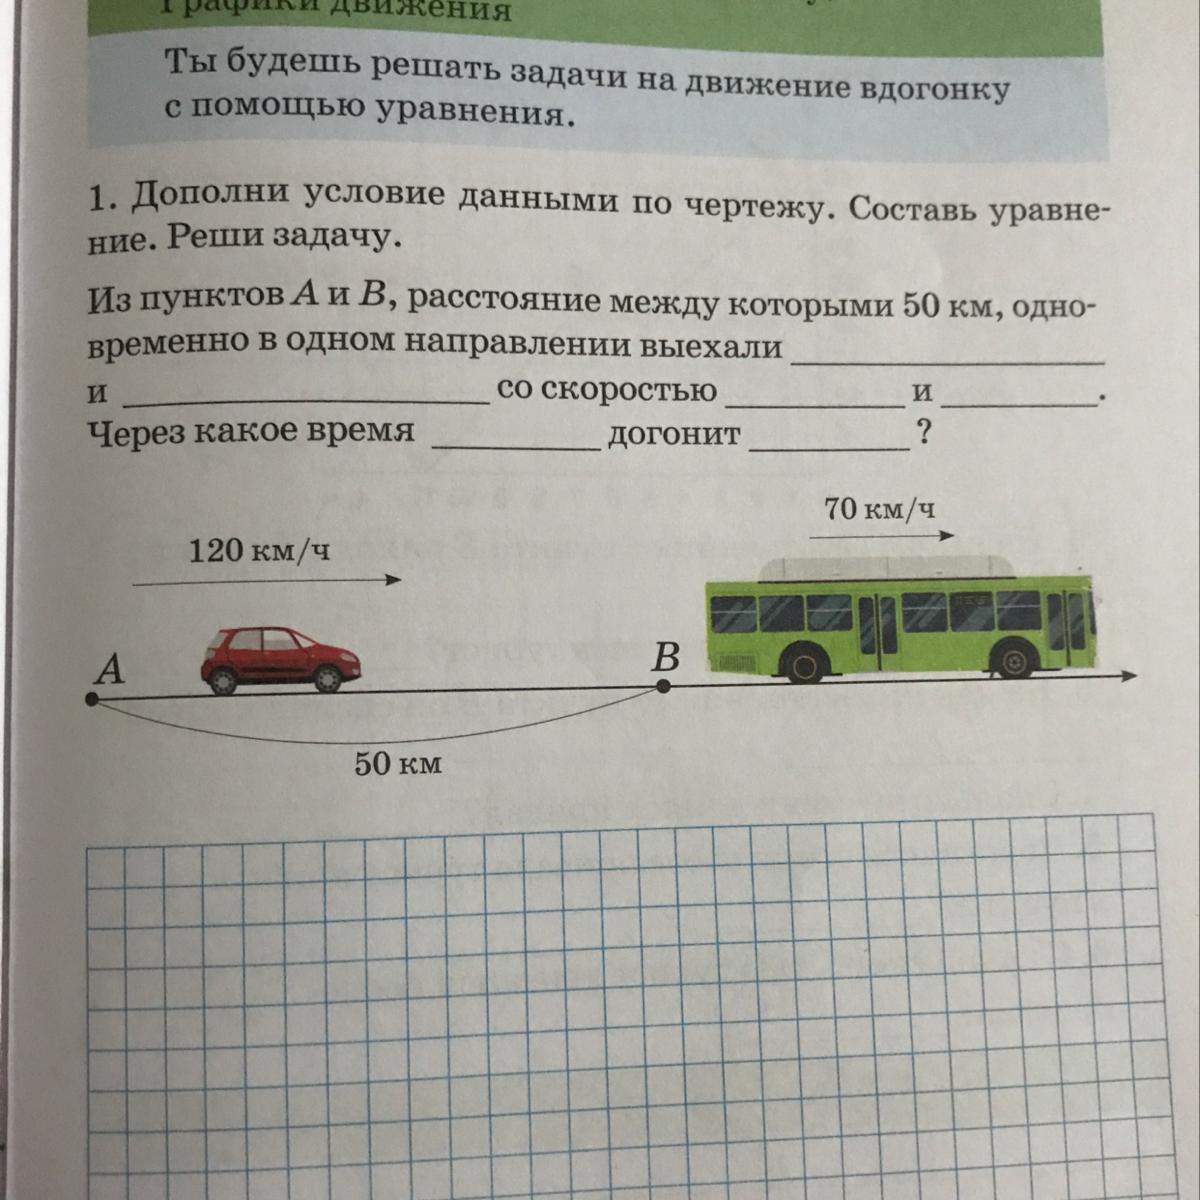 Дополни условие и реши задачу 3 класс задачи в excel решение